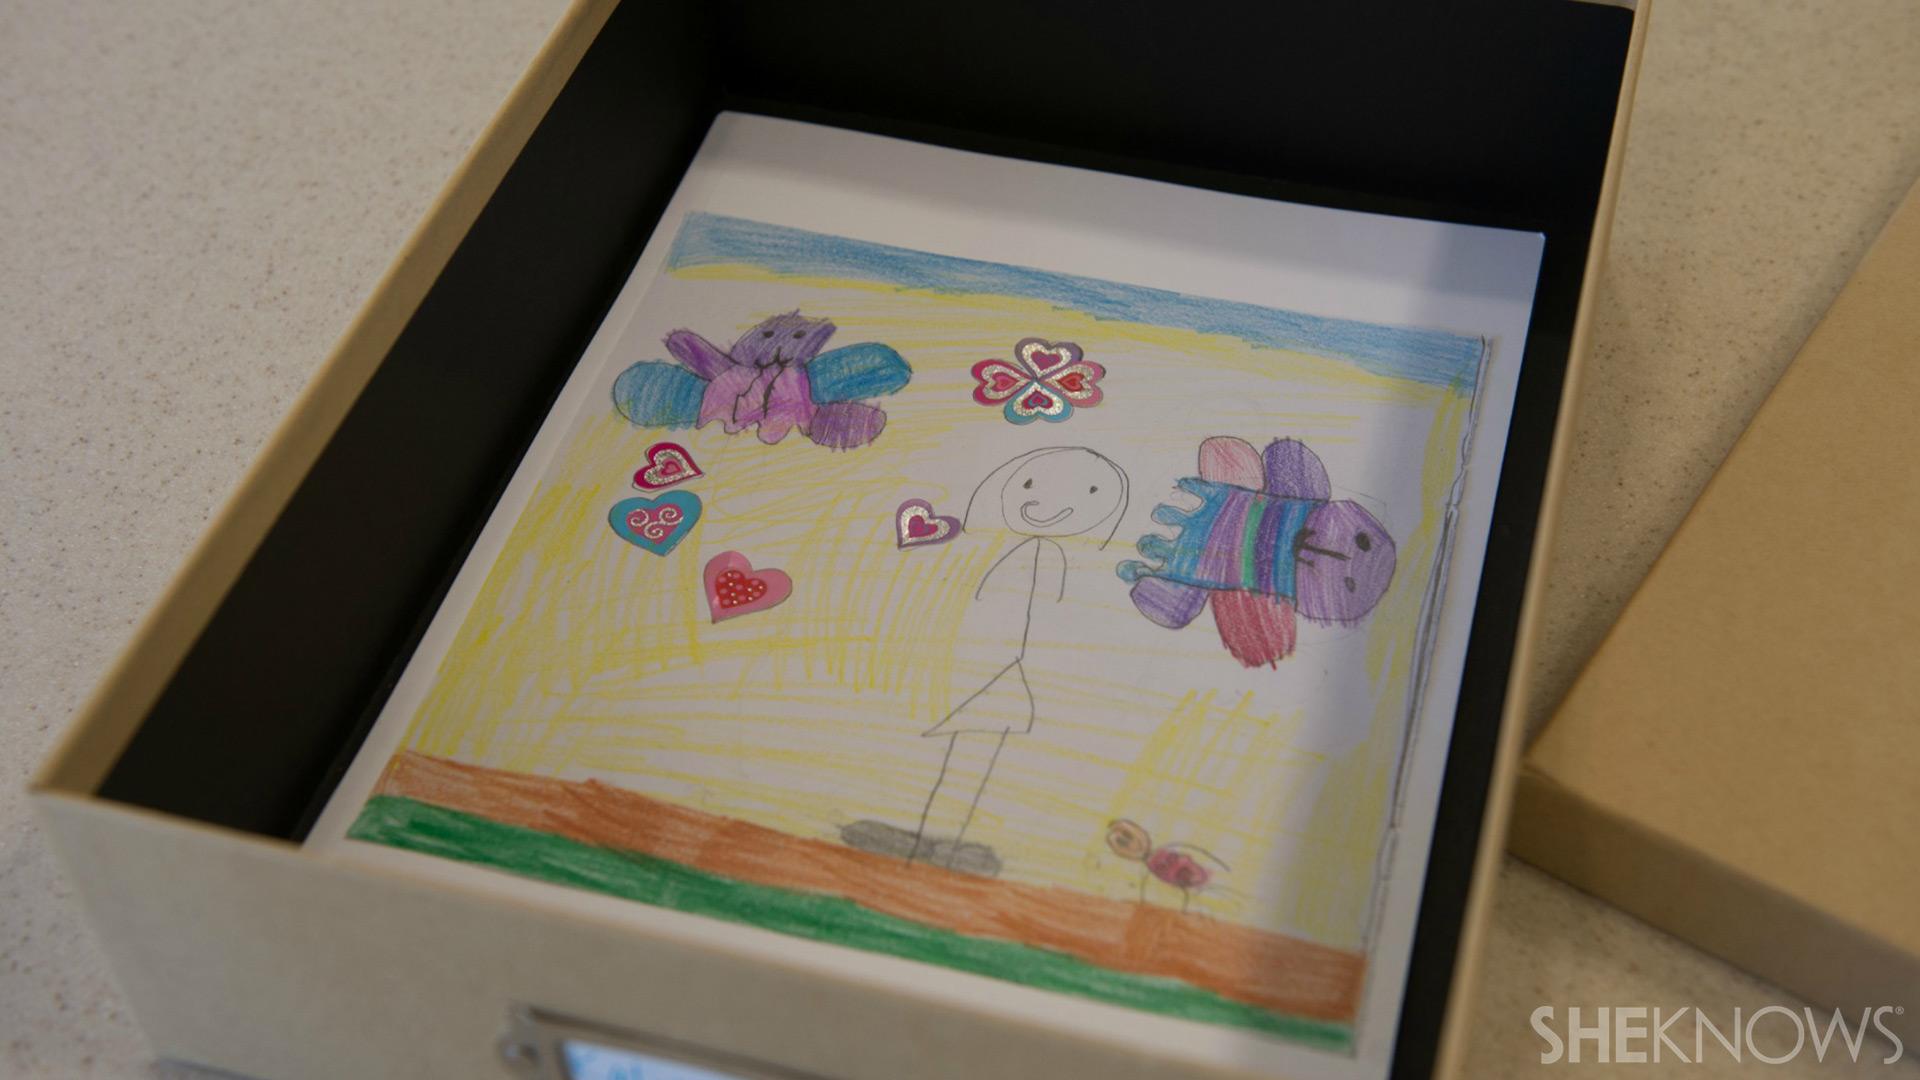 School project storage box   Sheknows.com - attach artwork